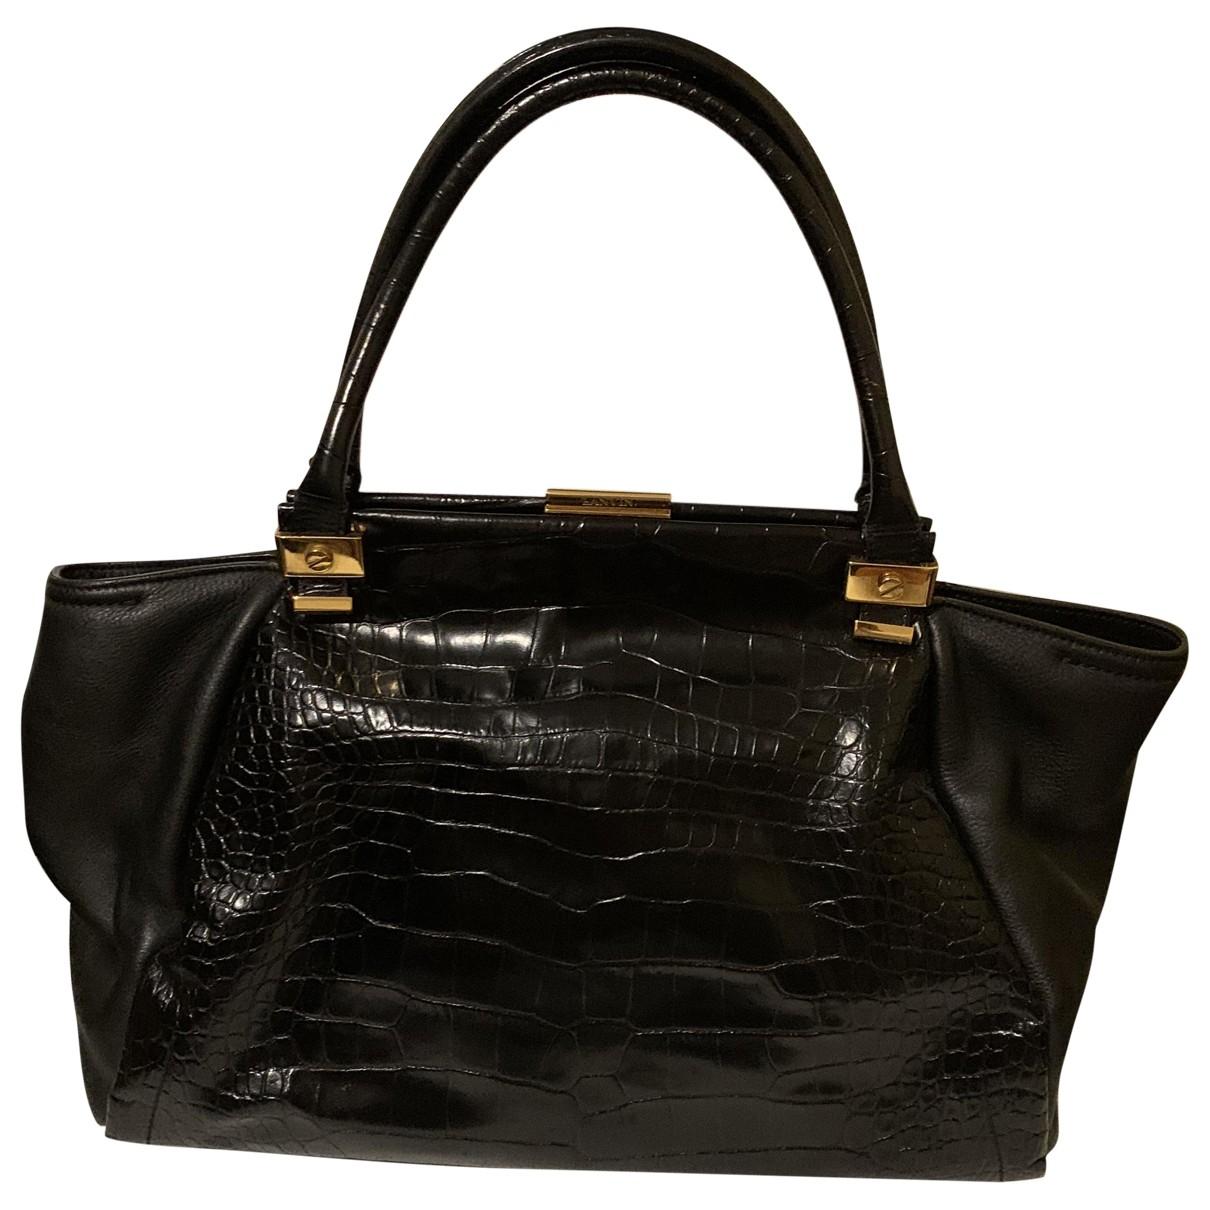 Lanvin \N Black Patent leather handbag for Women \N